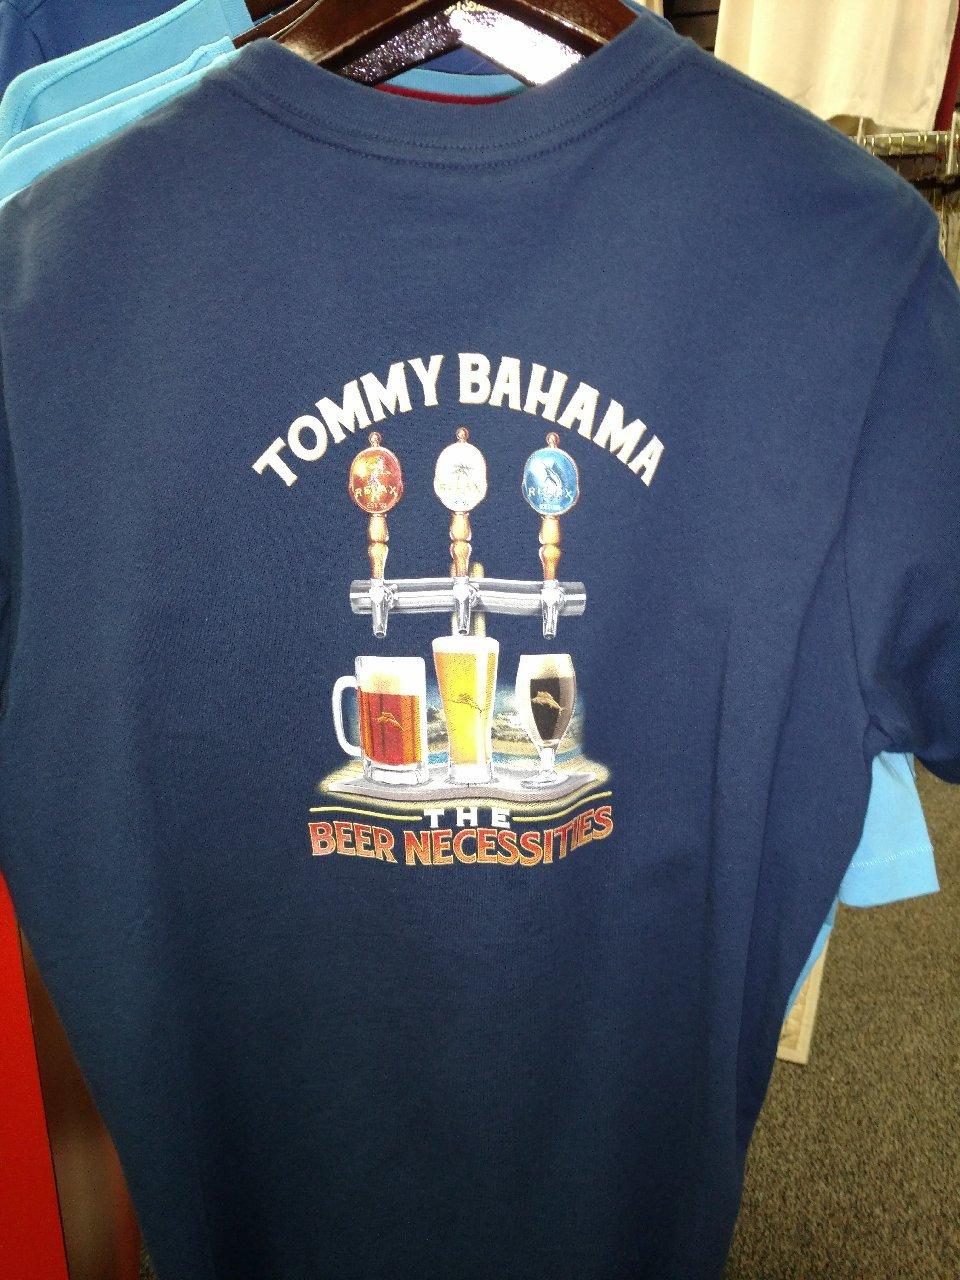 17f84548592 Tommy Bahama Beer Necessities Tee